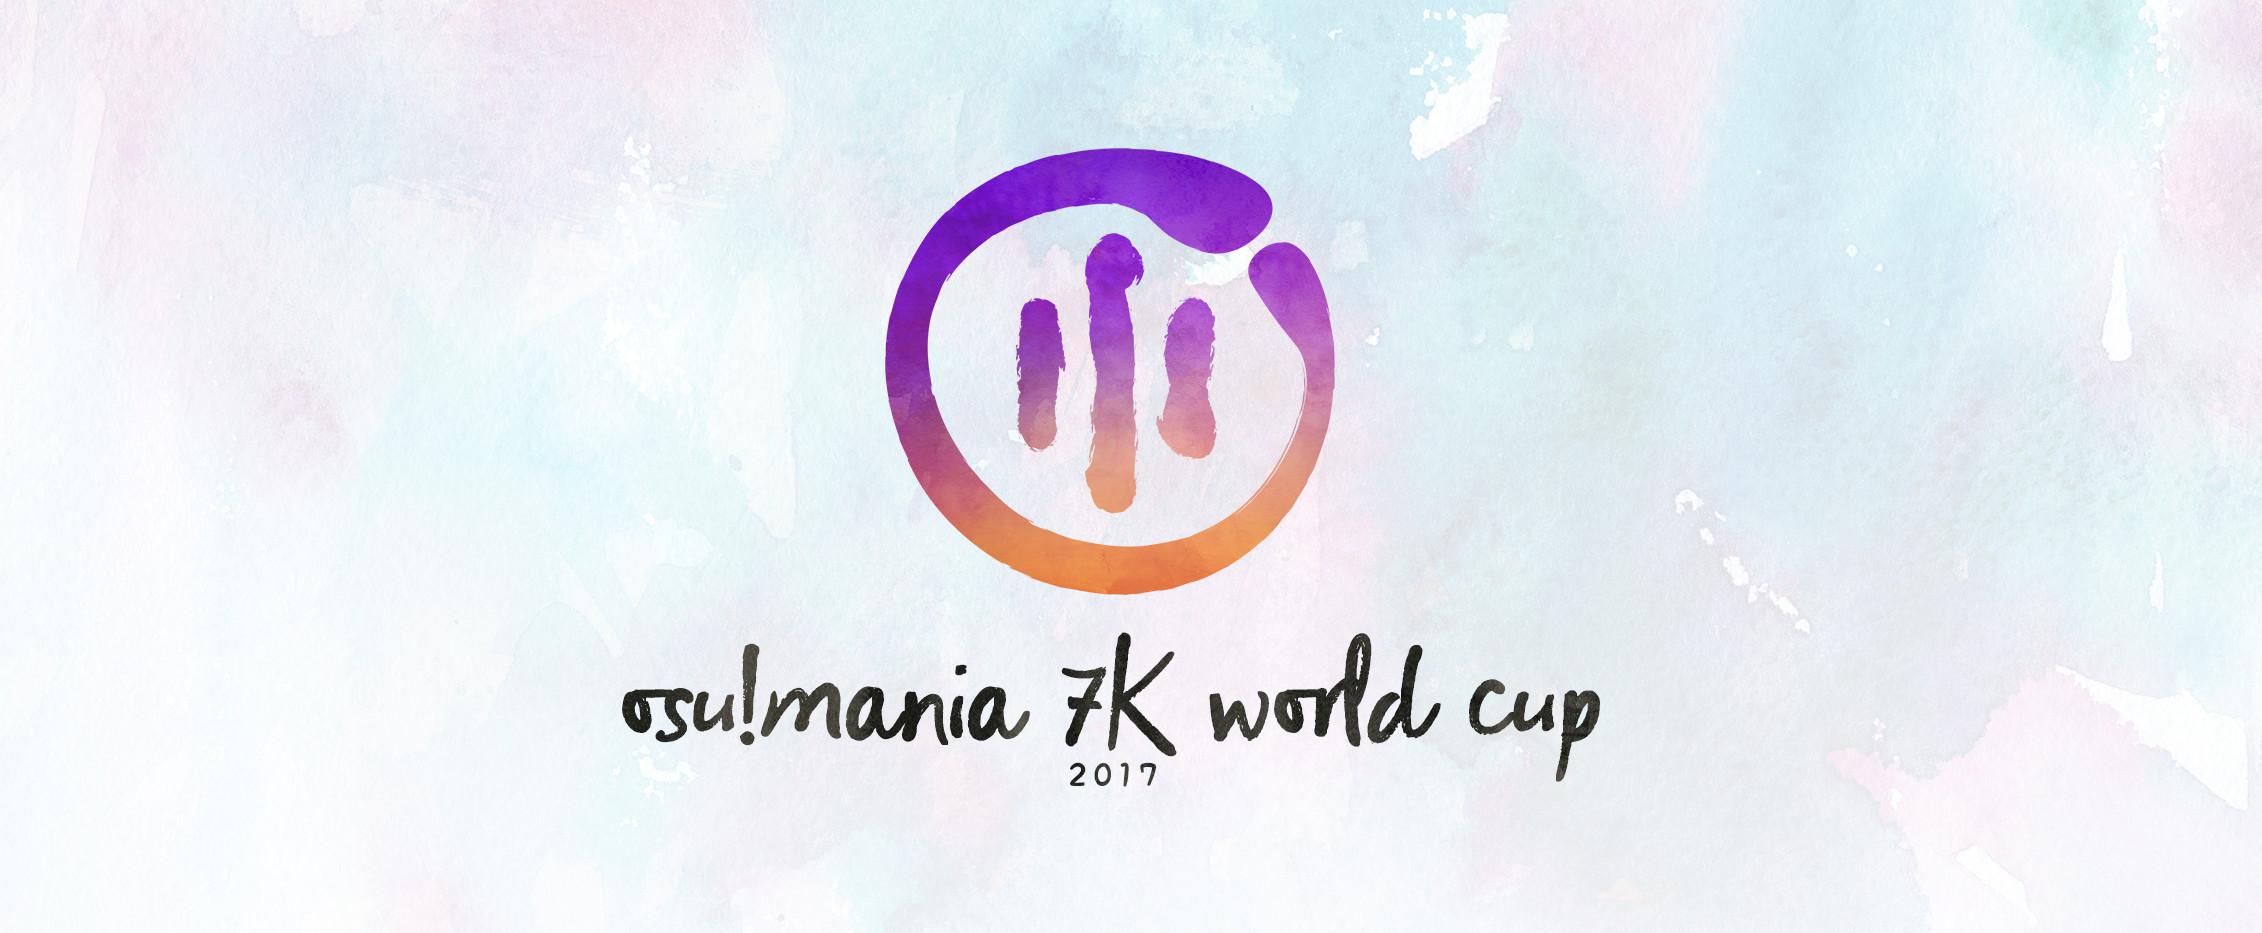 MWC 7K 2017 logo